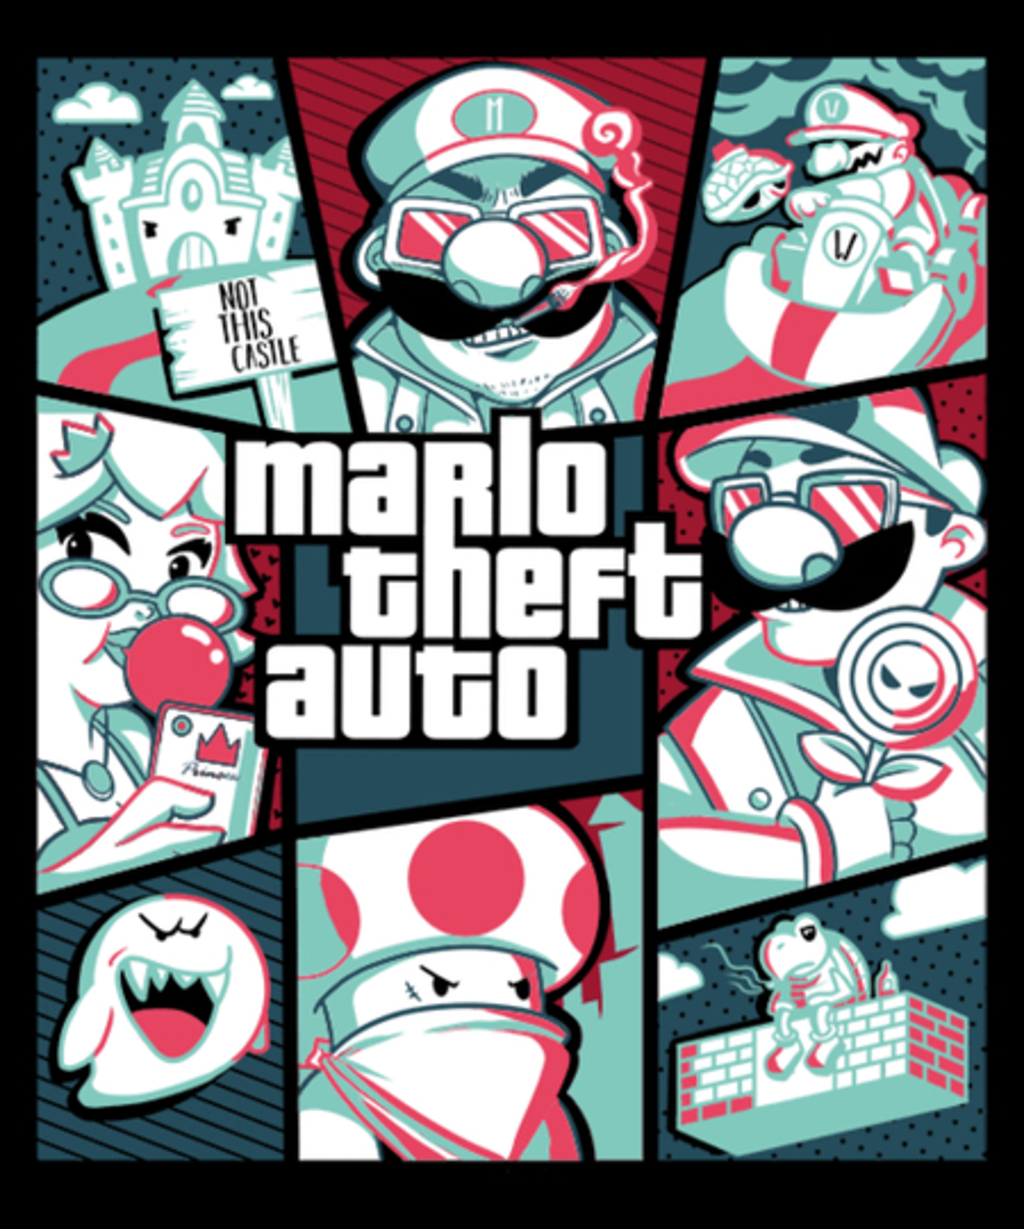 Qwertee: Mario Theft Auto